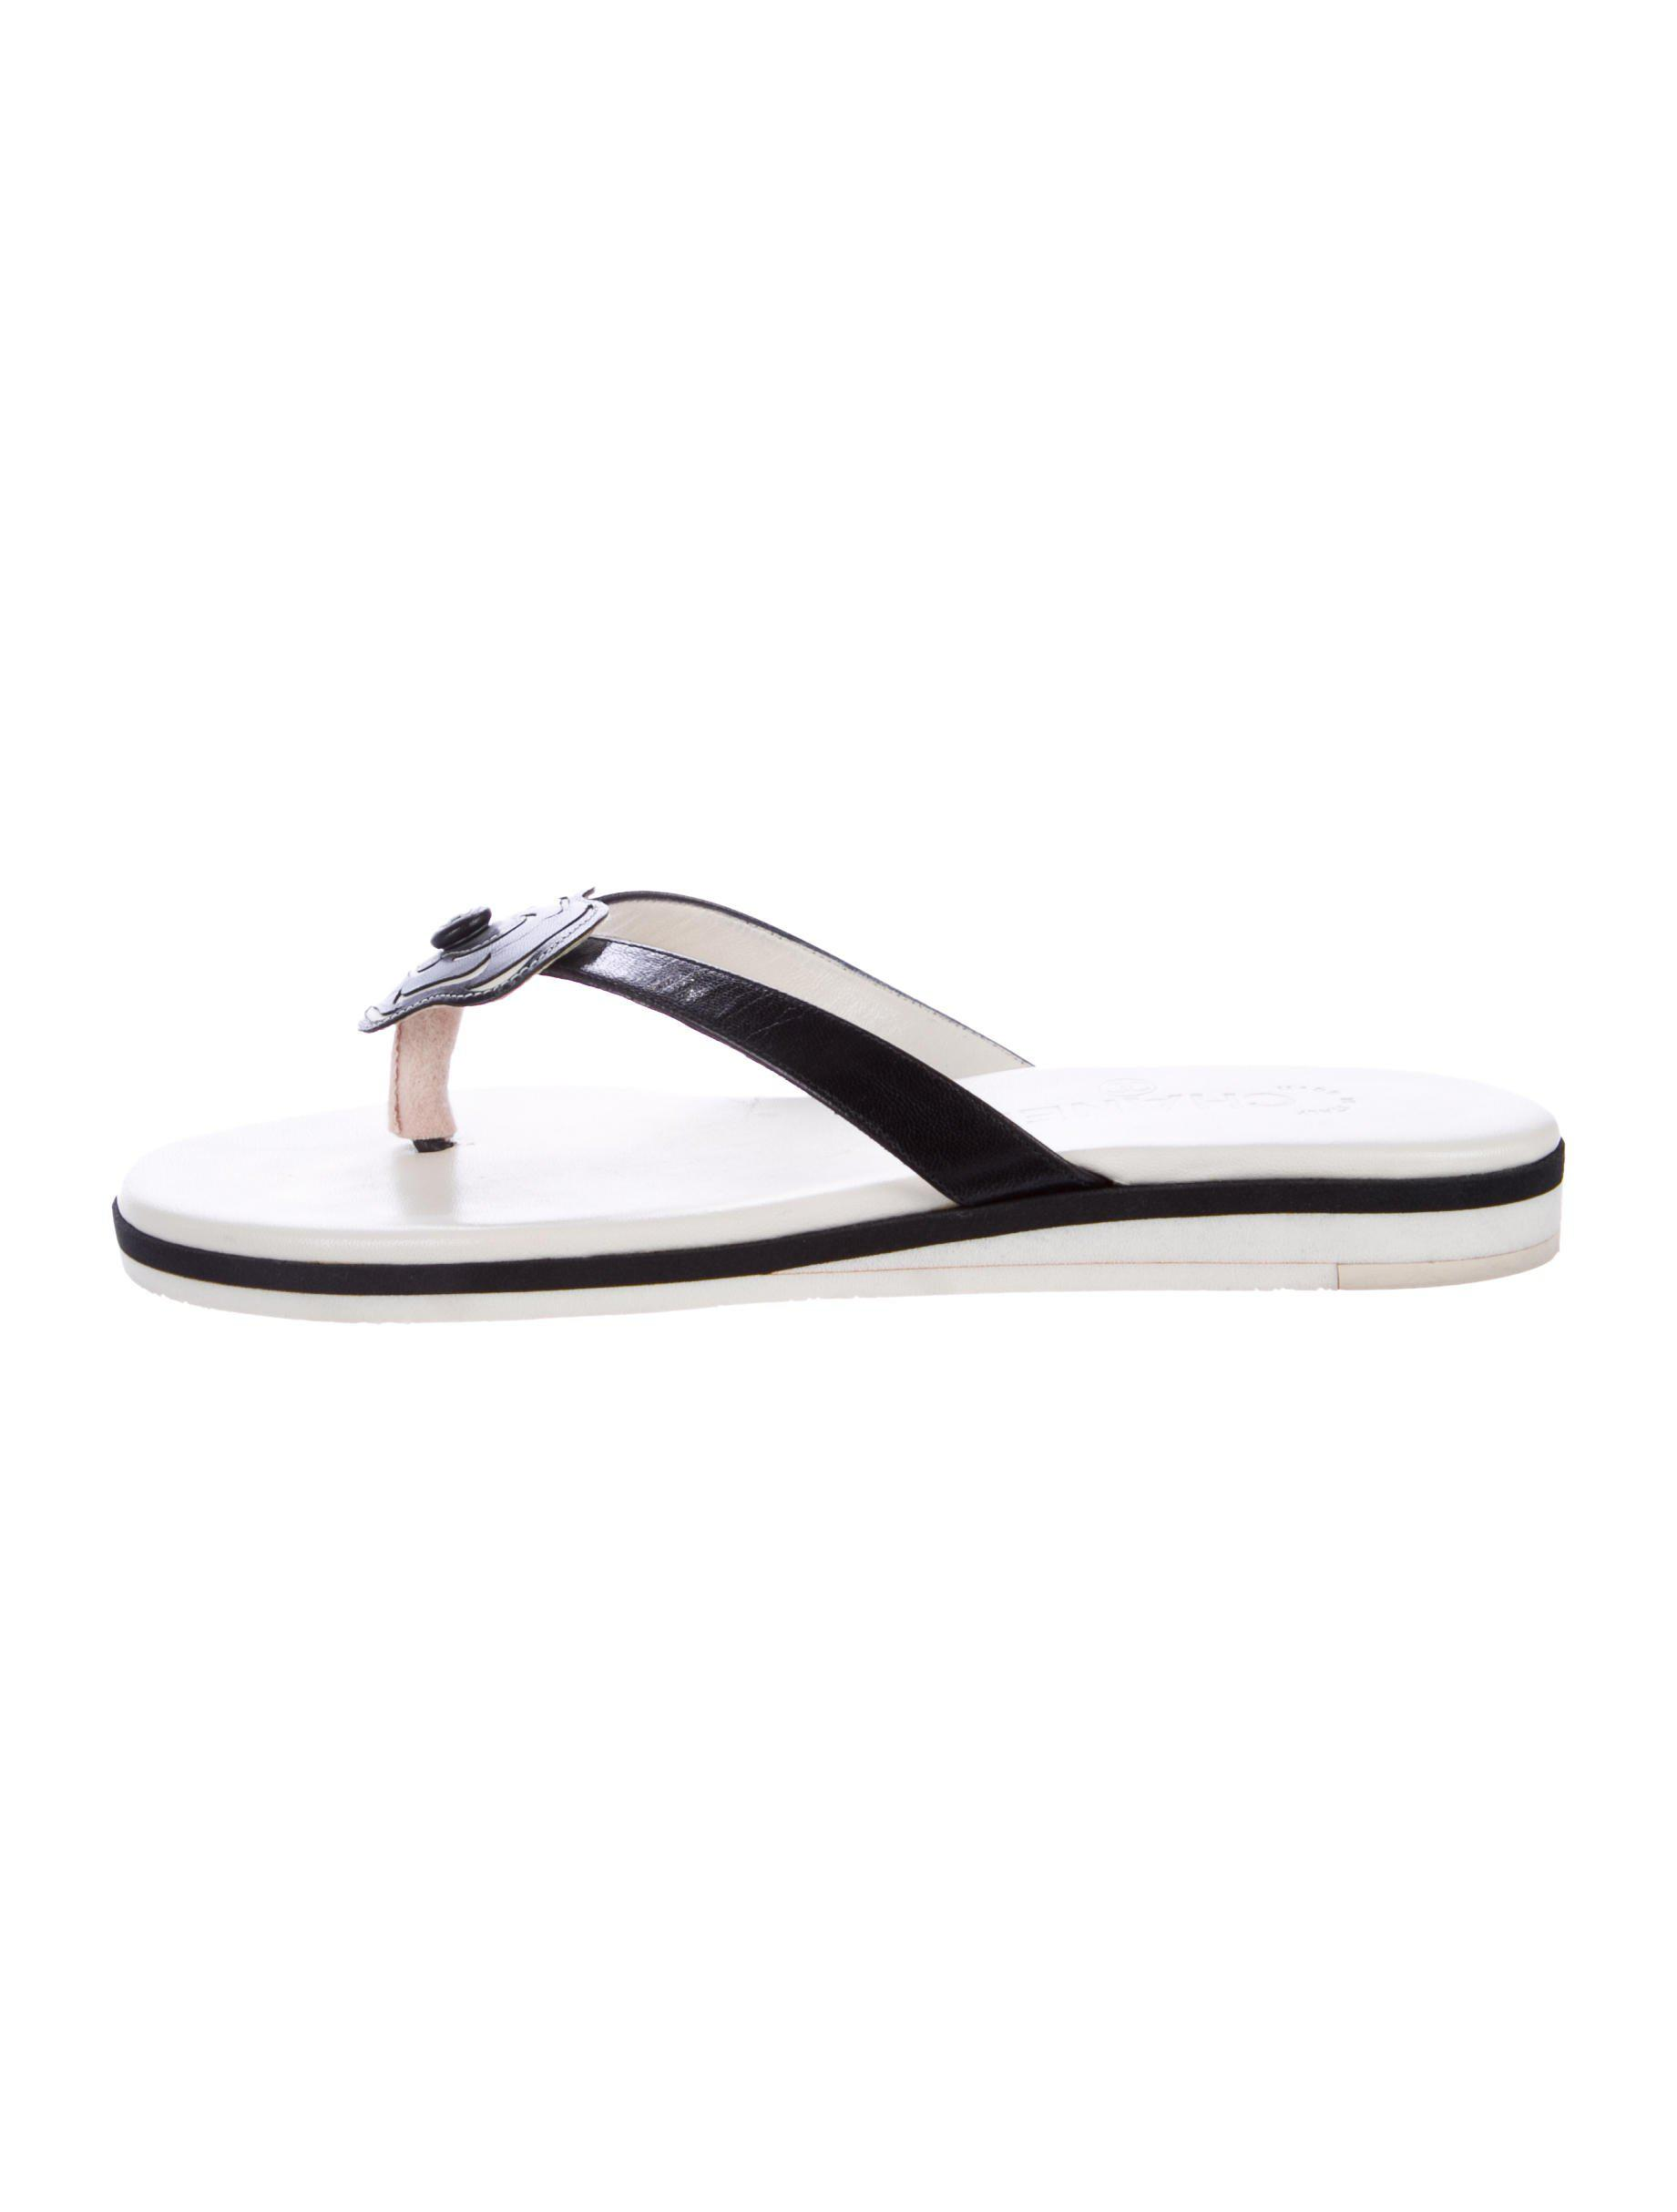 22e68c07eea722 Lyst - Chanel Camellia Cc Thong Sandals in Black